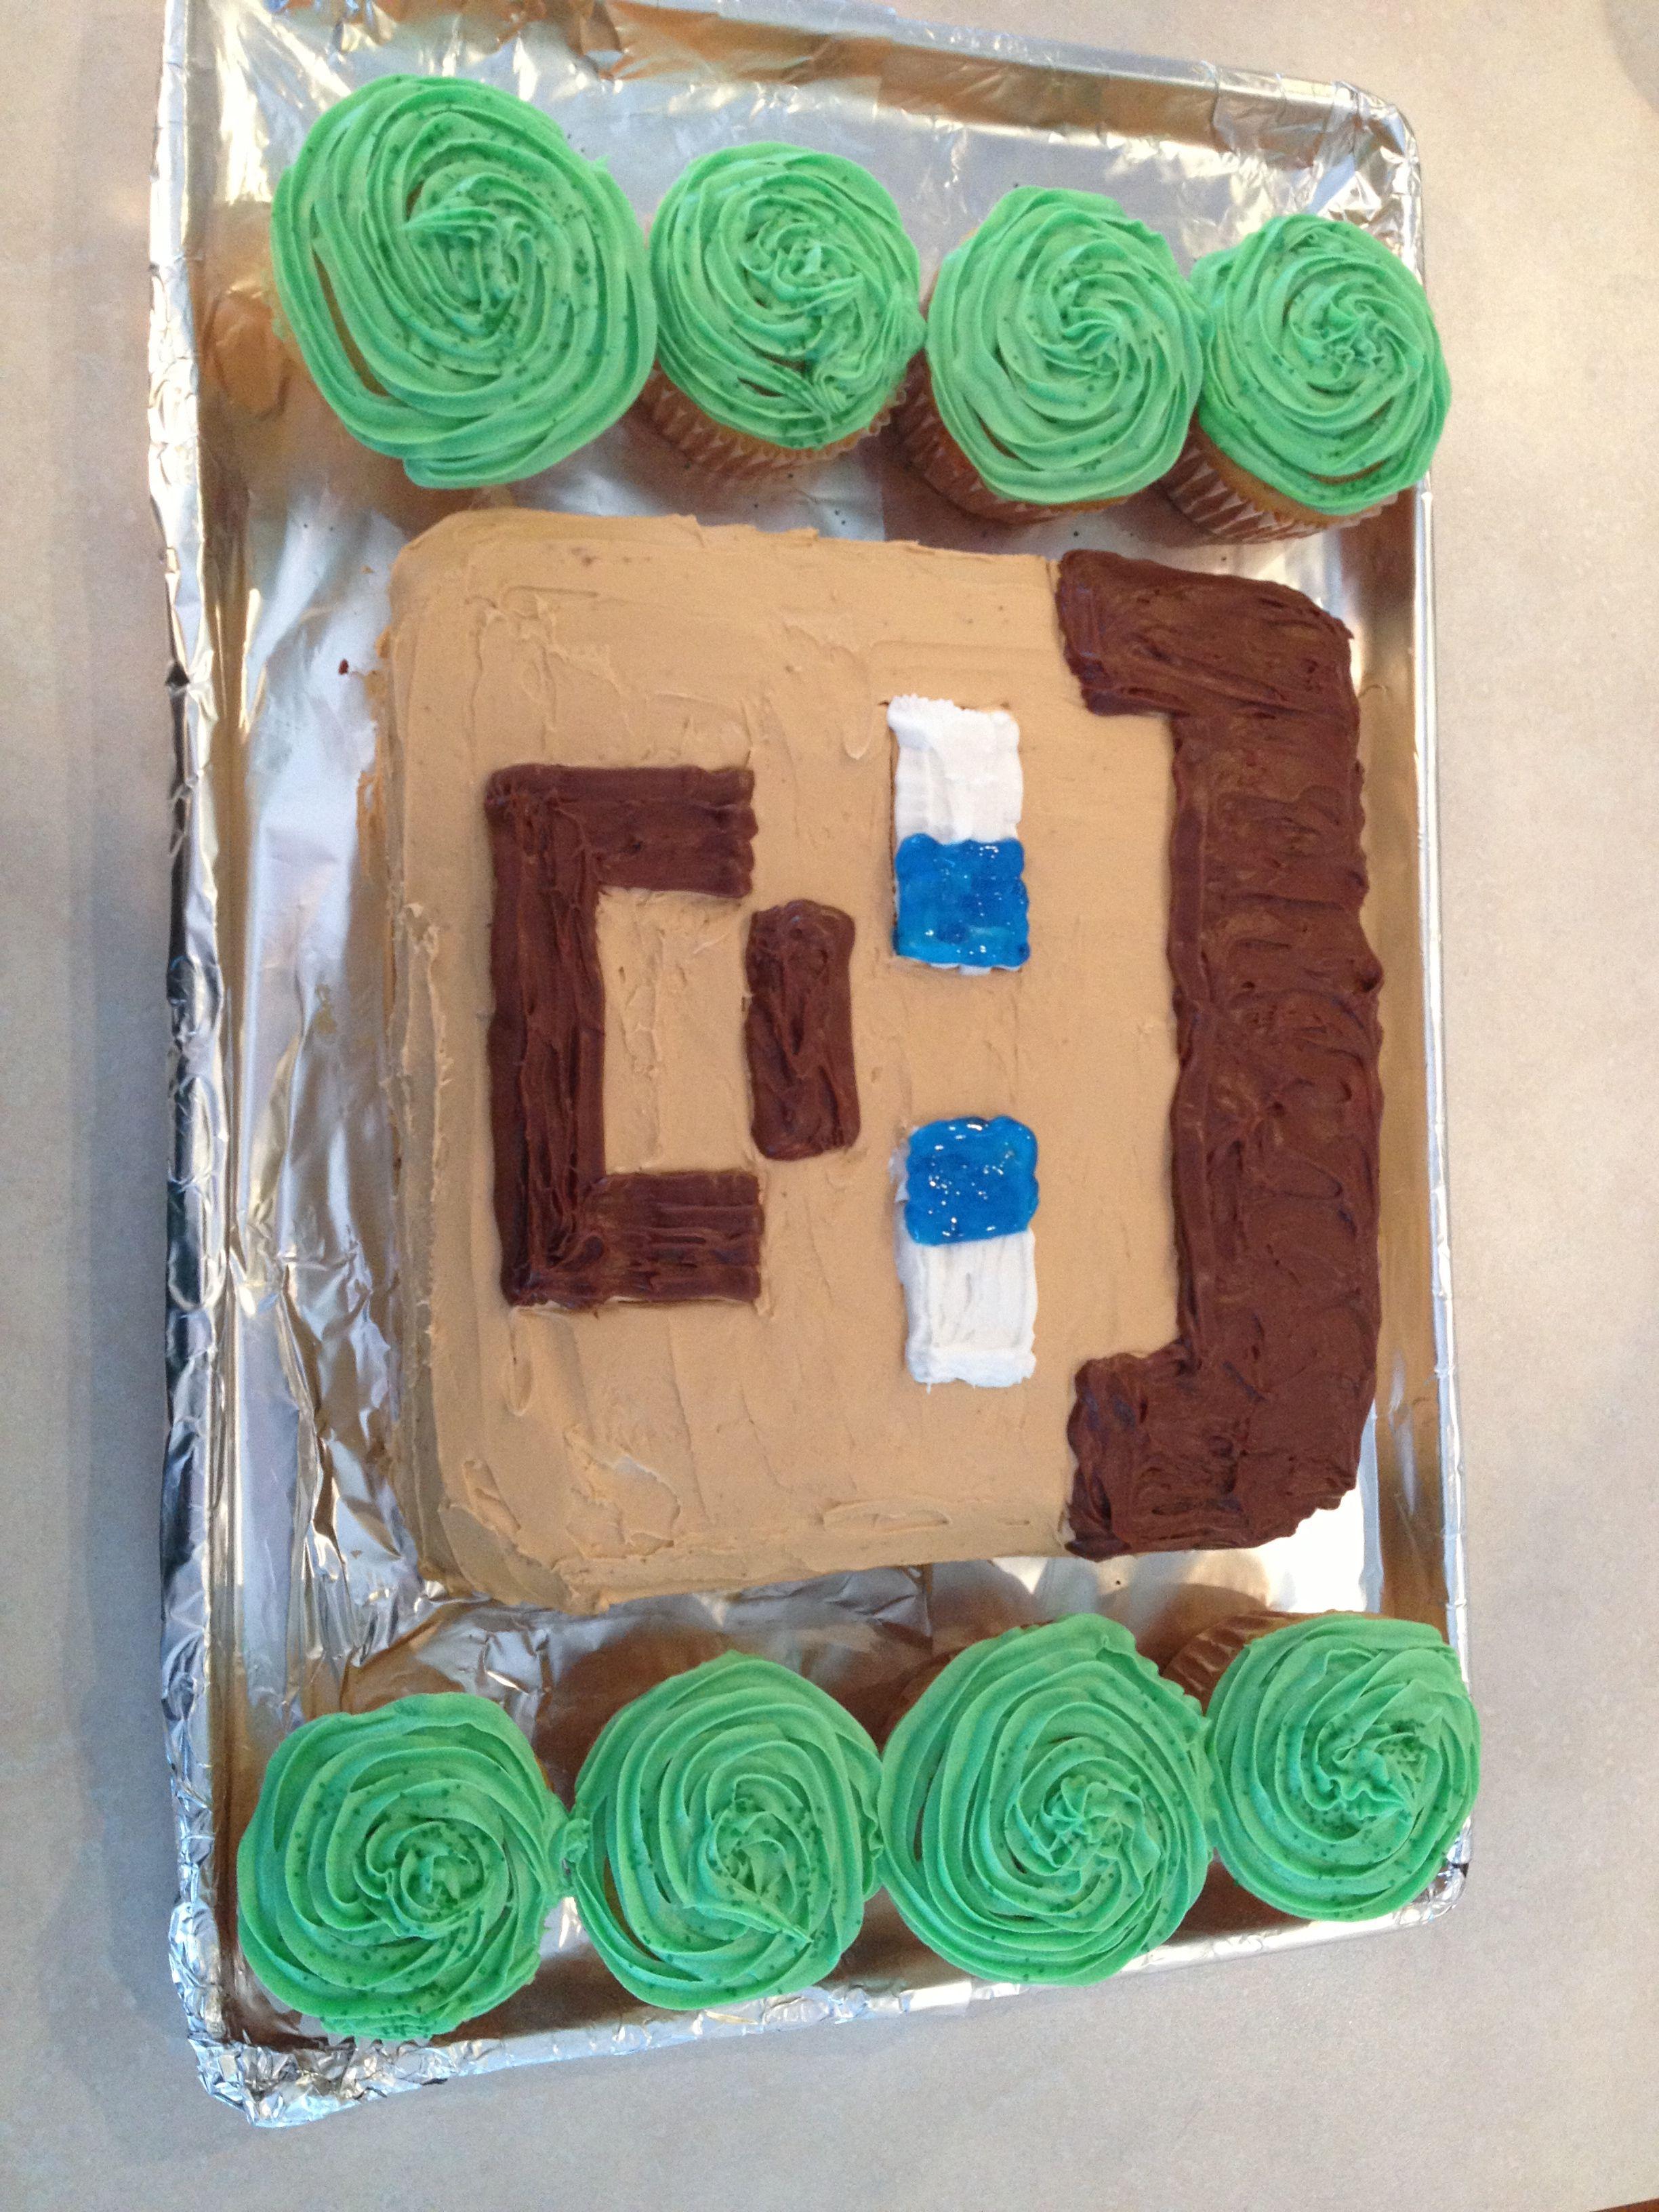 Minecraft Cake Steve Cakes Pinterest Minecraft cake Cake